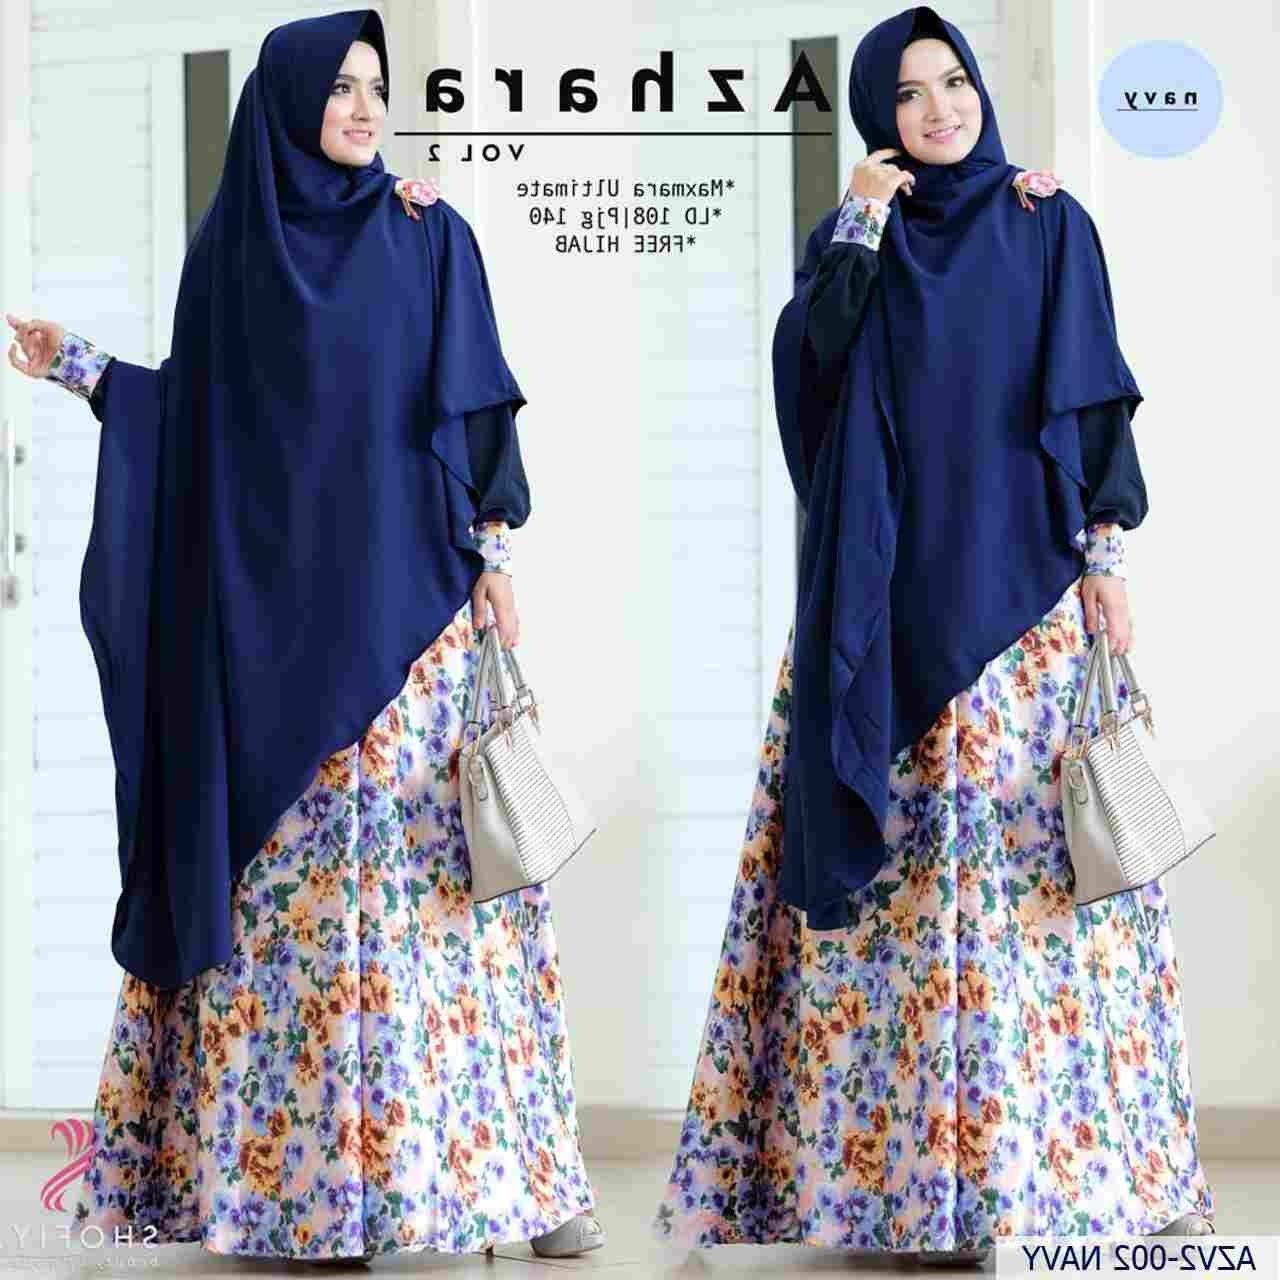 Ide Gambar Baju Lebaran Tahun 2019 Whdr Trend Model Baju Lebaran Tahun 2019 Gambar islami